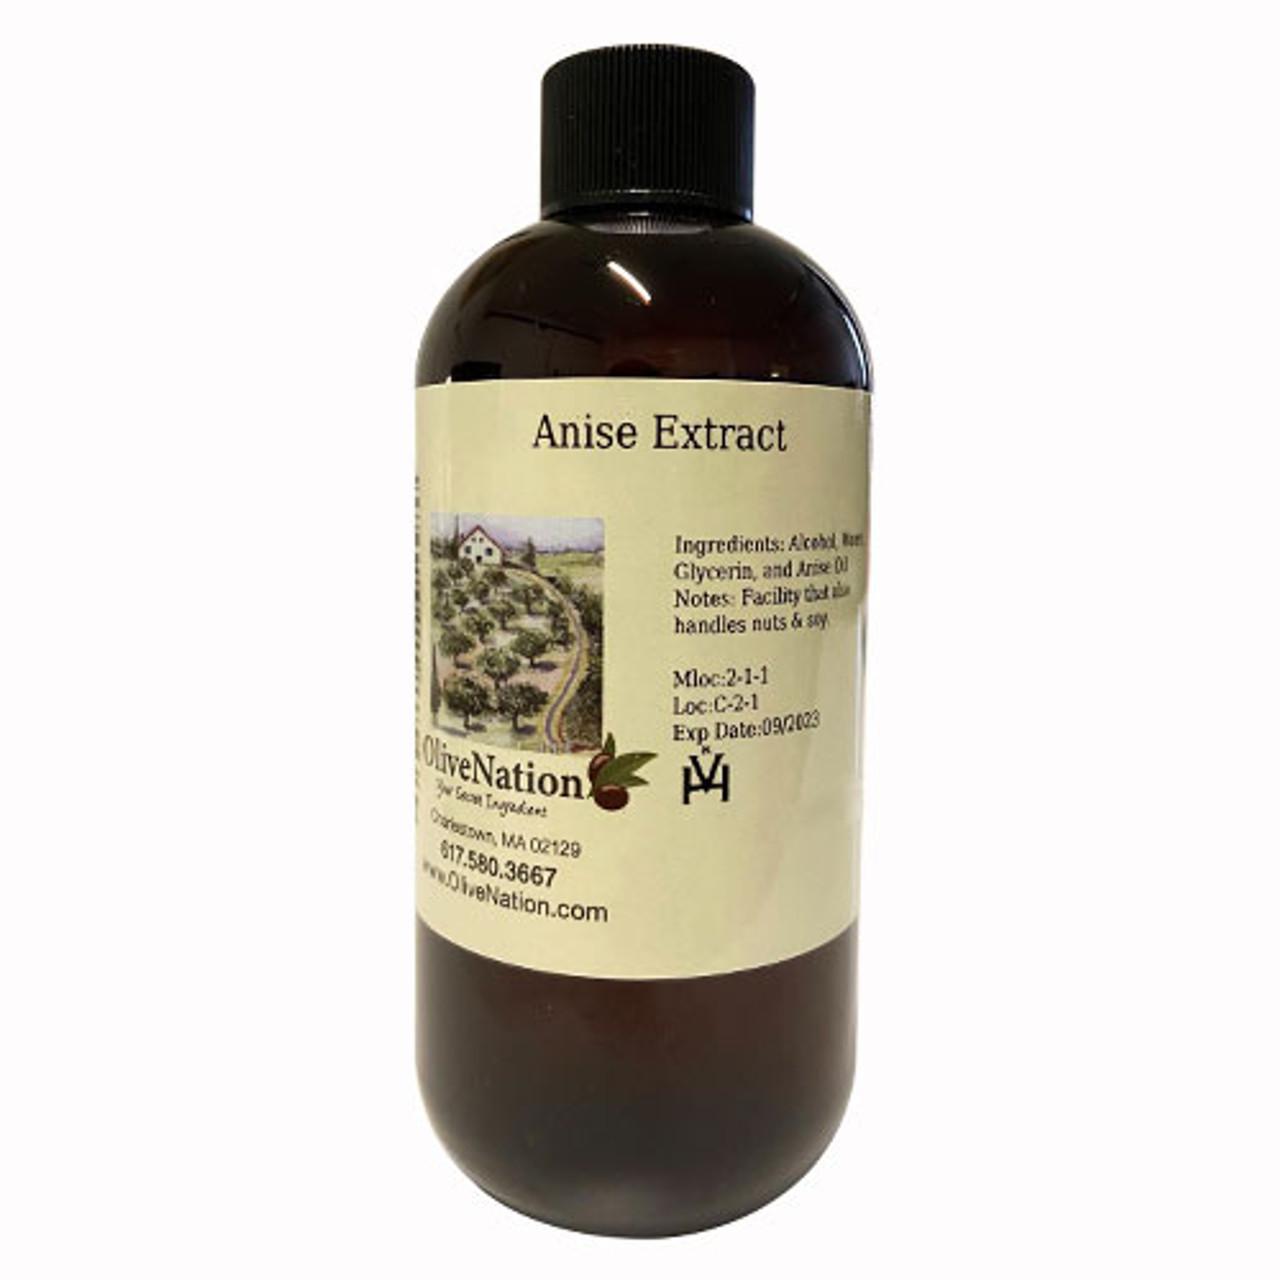 OliveNation Anise Extract